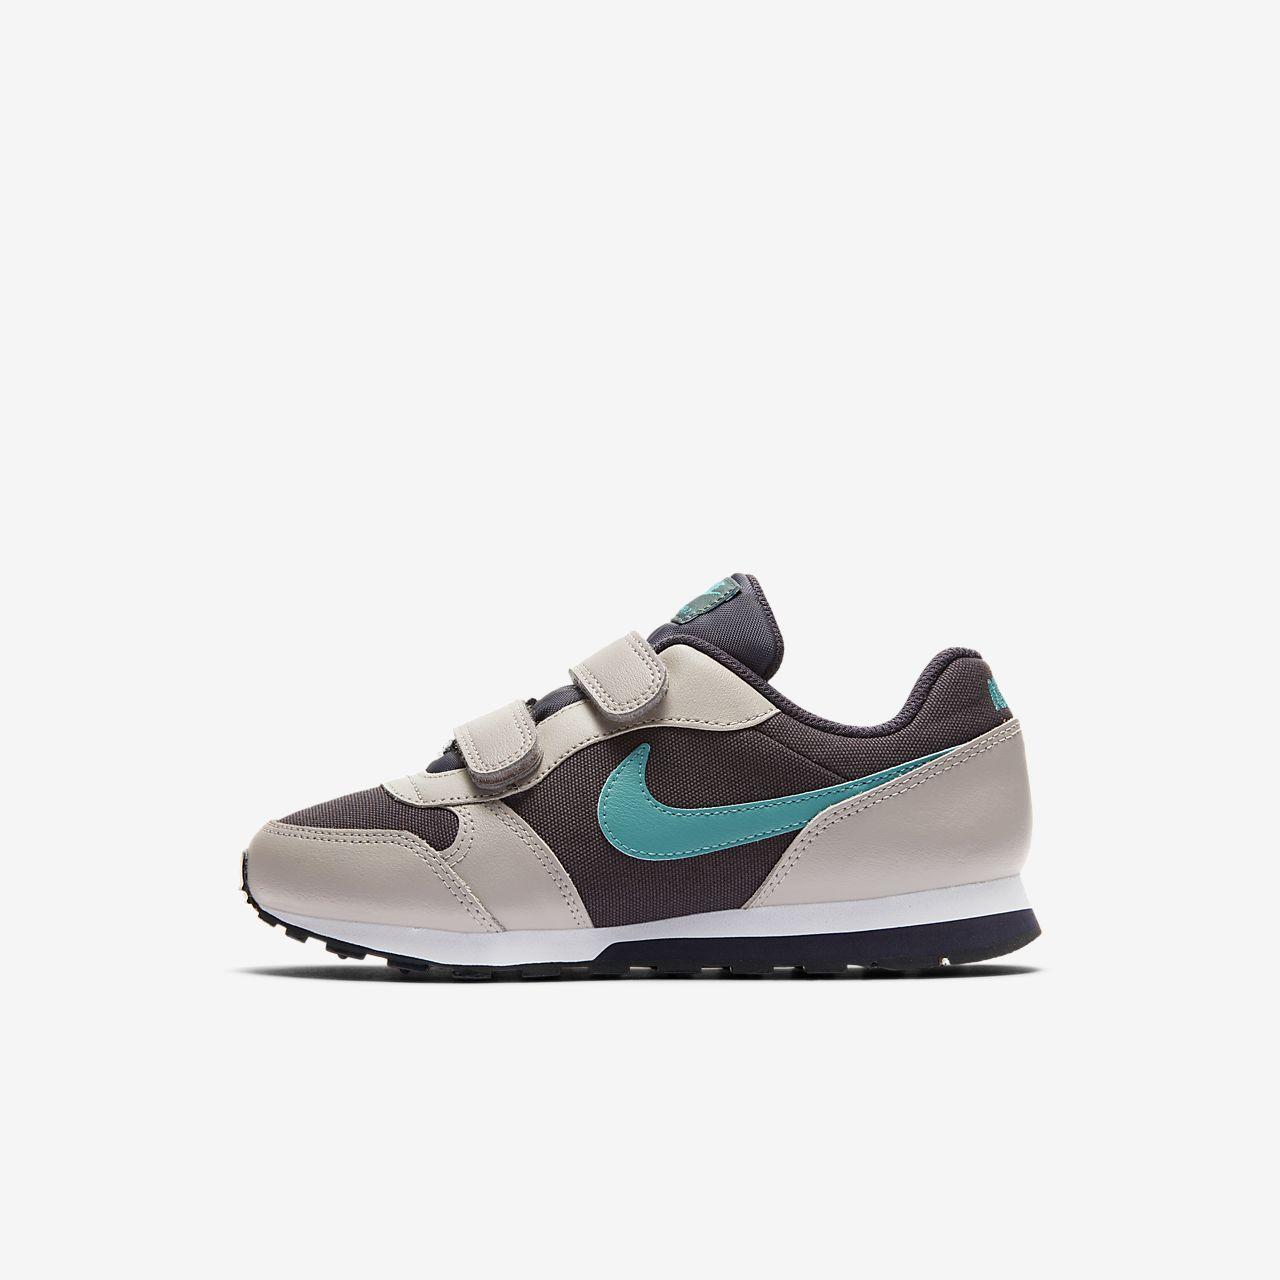 Nike MD Runner 2 cipő kisebb gyerekeknek